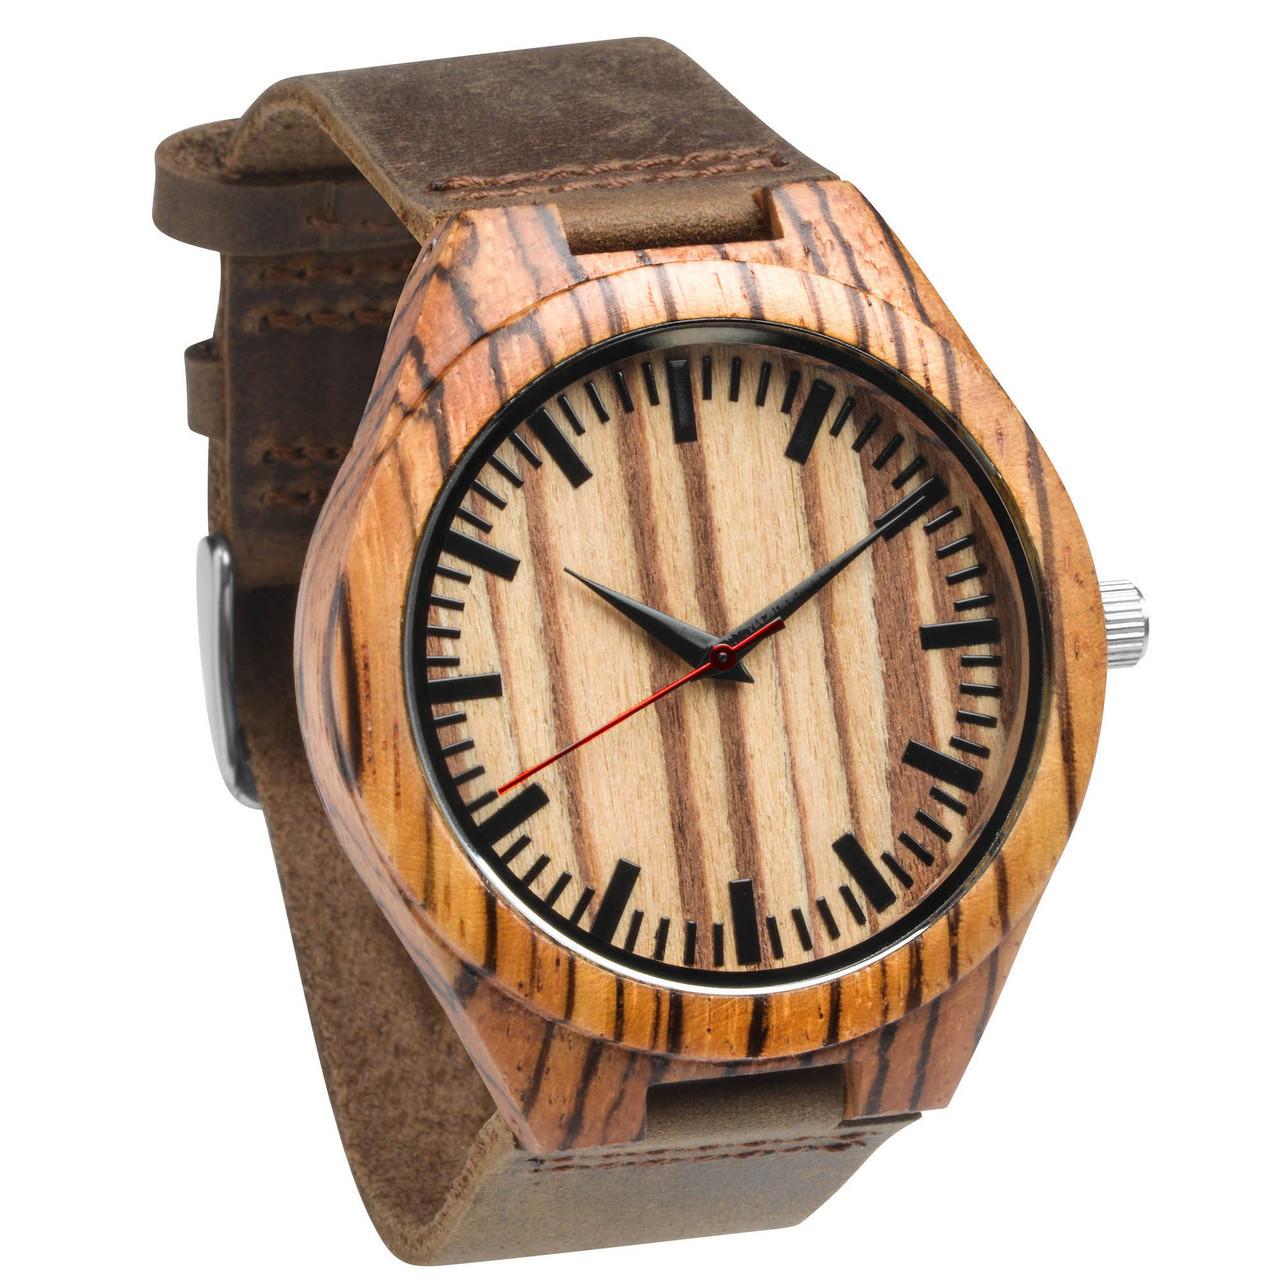 Grpn Spain - Wood Engraved Watch W#76 - Zebrawood